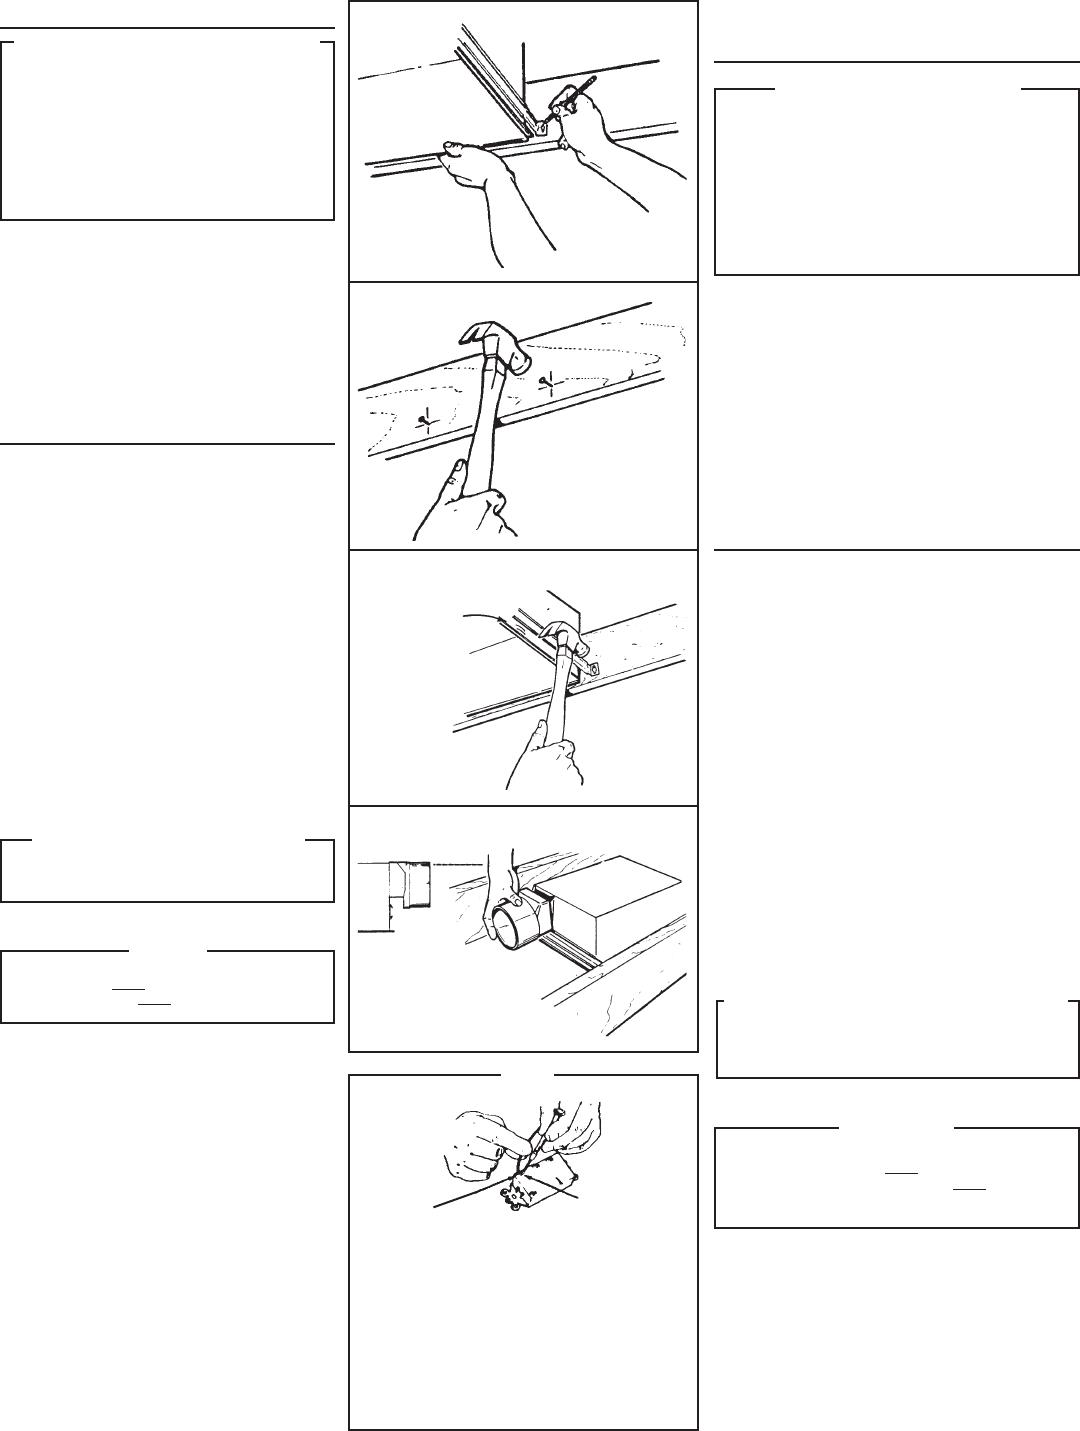 Broan 655 Wiring Diagram from usermanual.wiki